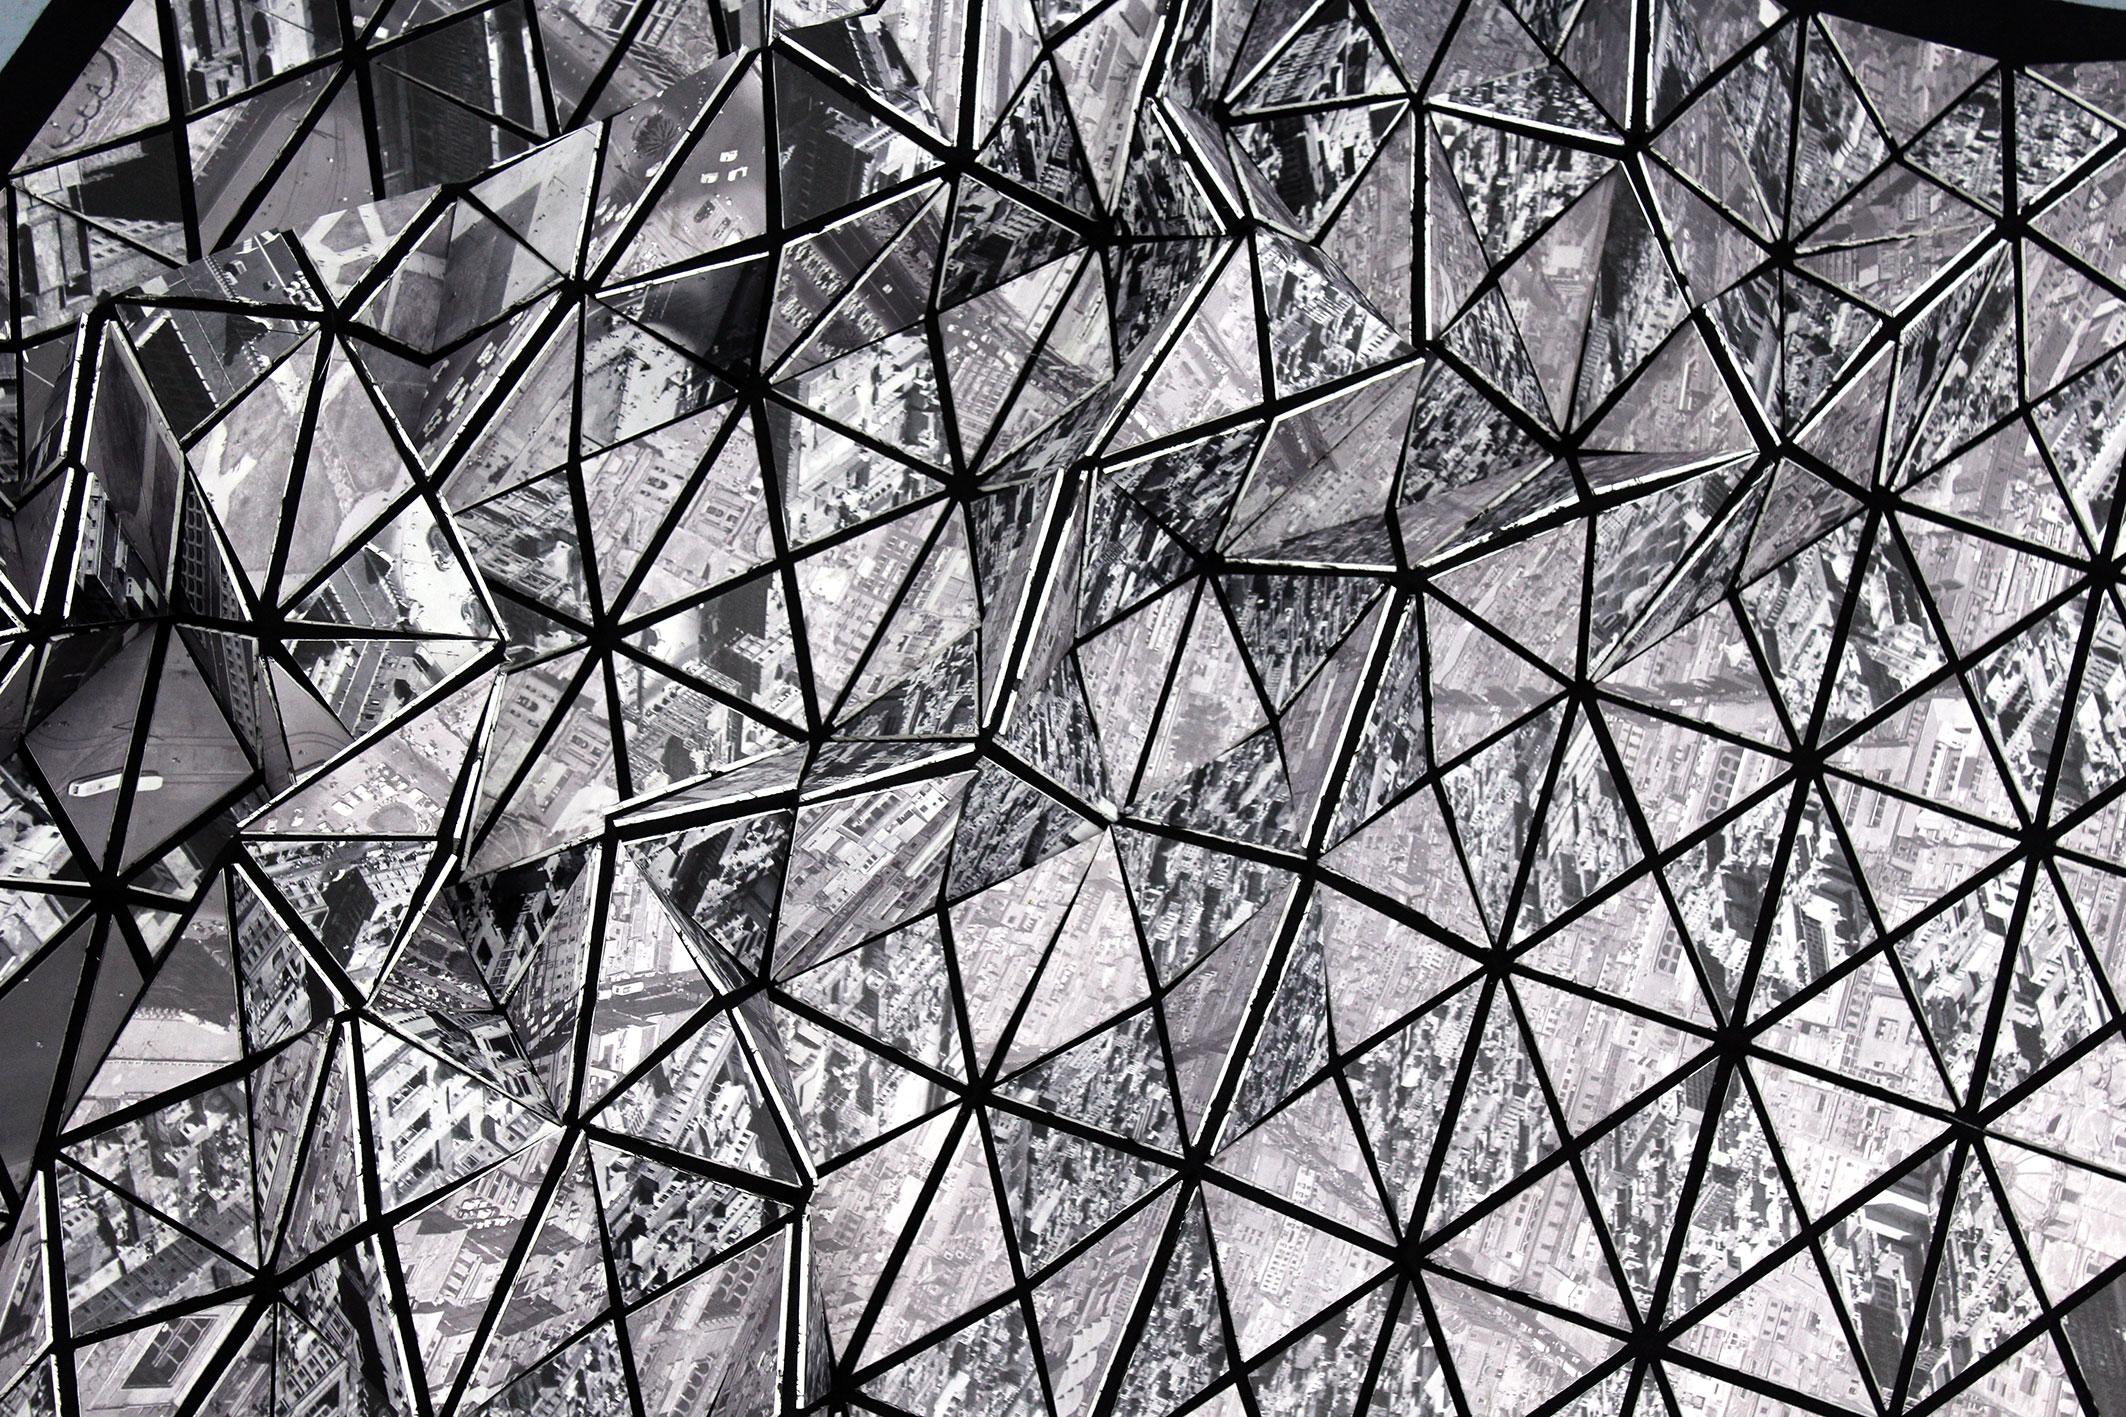 Quirarte + Ornelas / Estructura poligonal - Zócalo, 2016